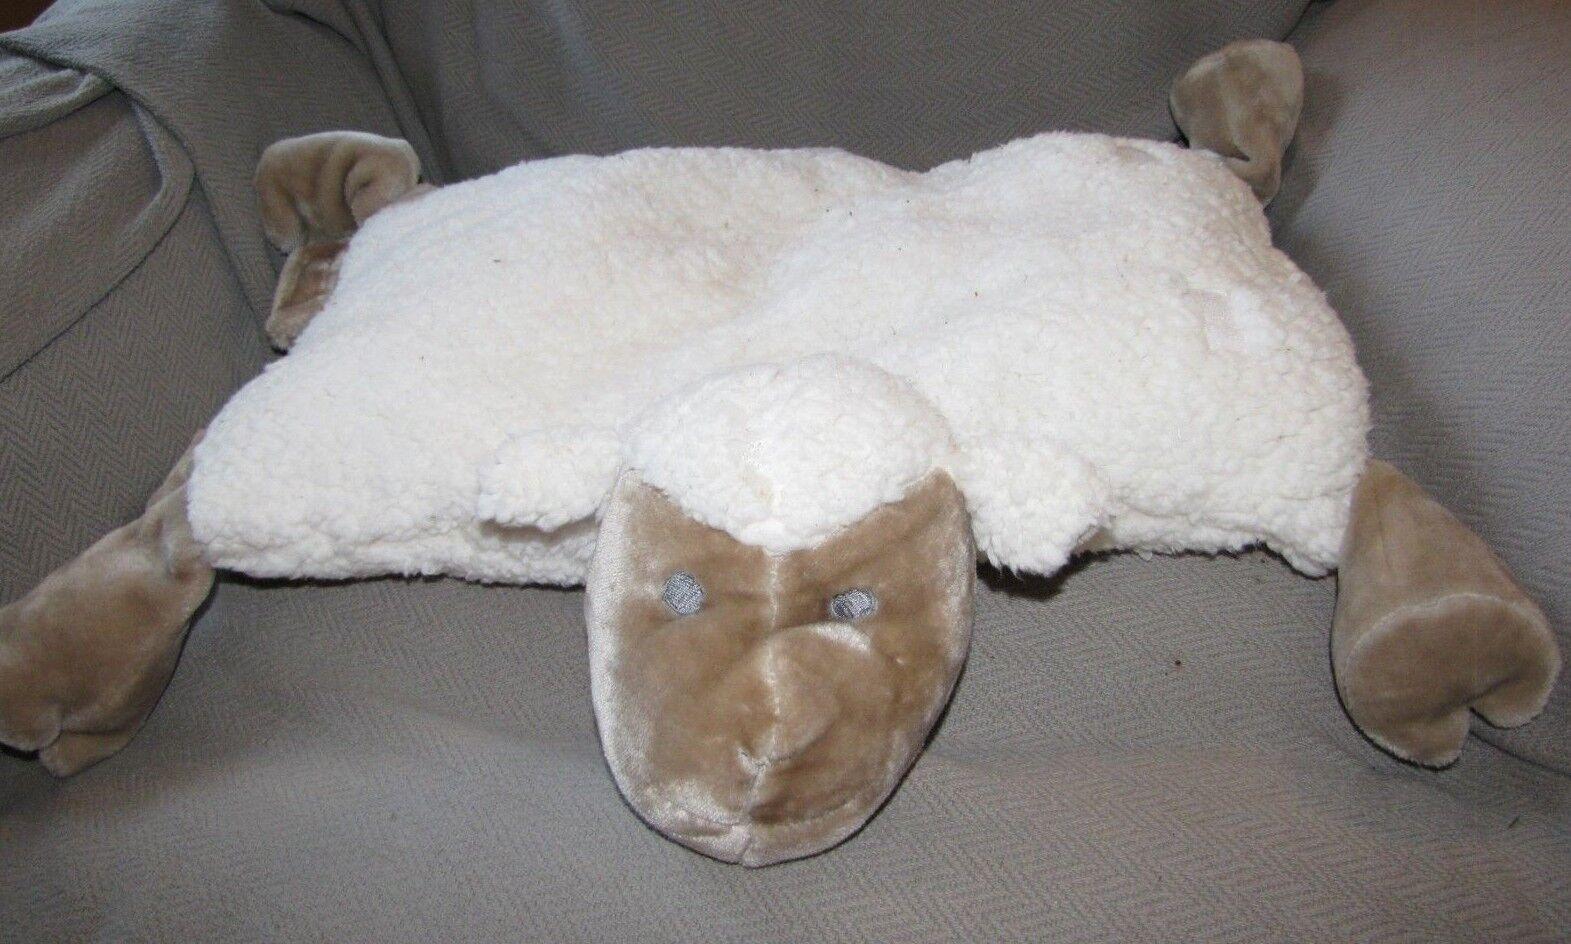 BOOKS ARE FUN STUFFED PLUSH SHEEP LAMB PILLOW ANIMAL TOY CREAM IVORY TAN